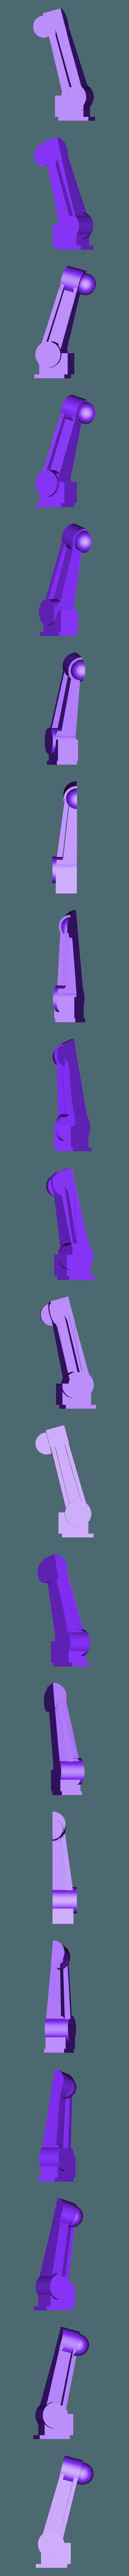 turantula_legs_1.stl Download free STL file Automated Weapon Platform Mod kit (Tarantula) • Model to 3D print, JtStrait72